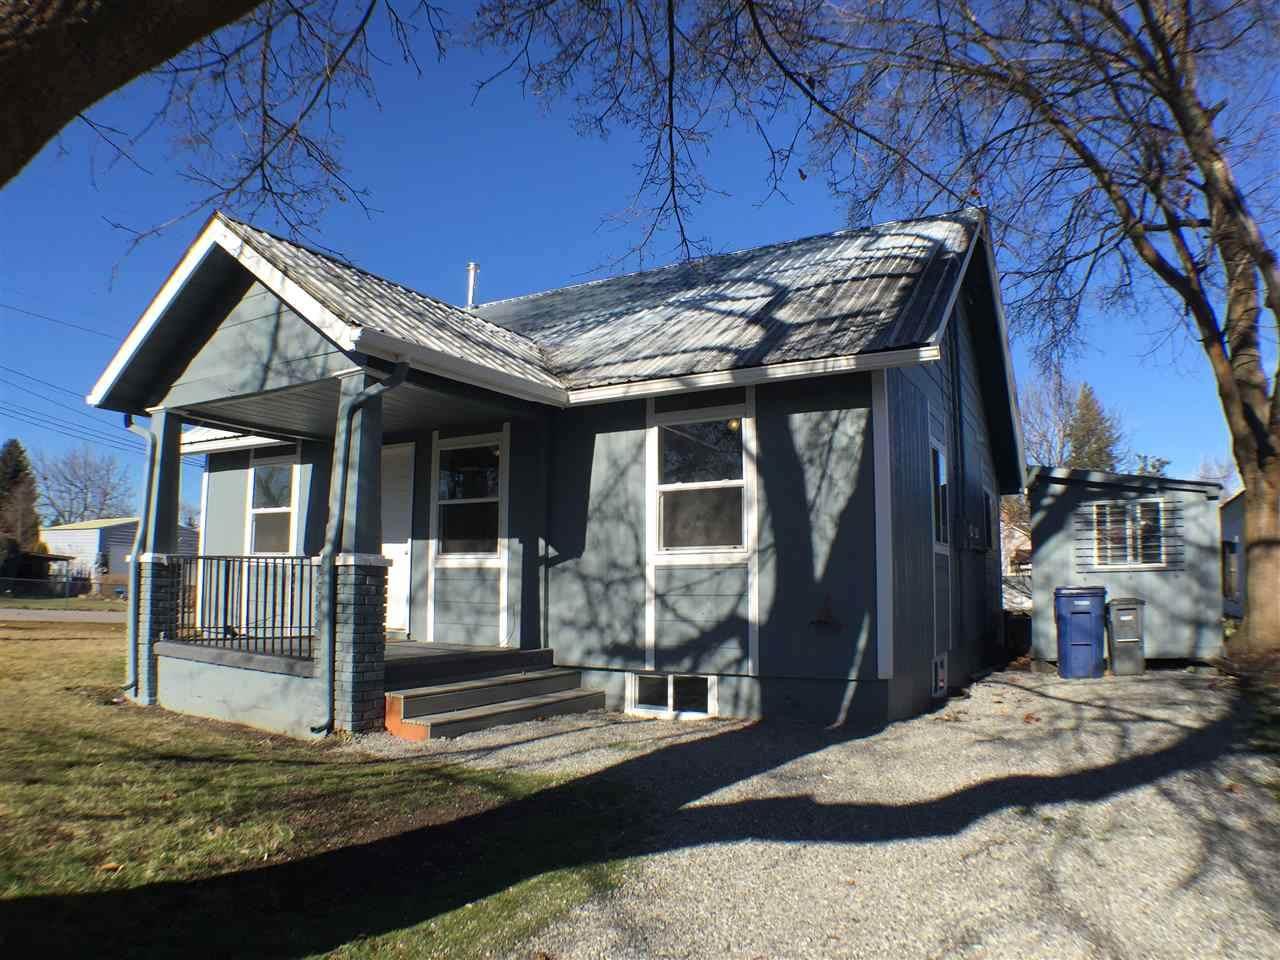 8505 Alki Ave - Photo 1